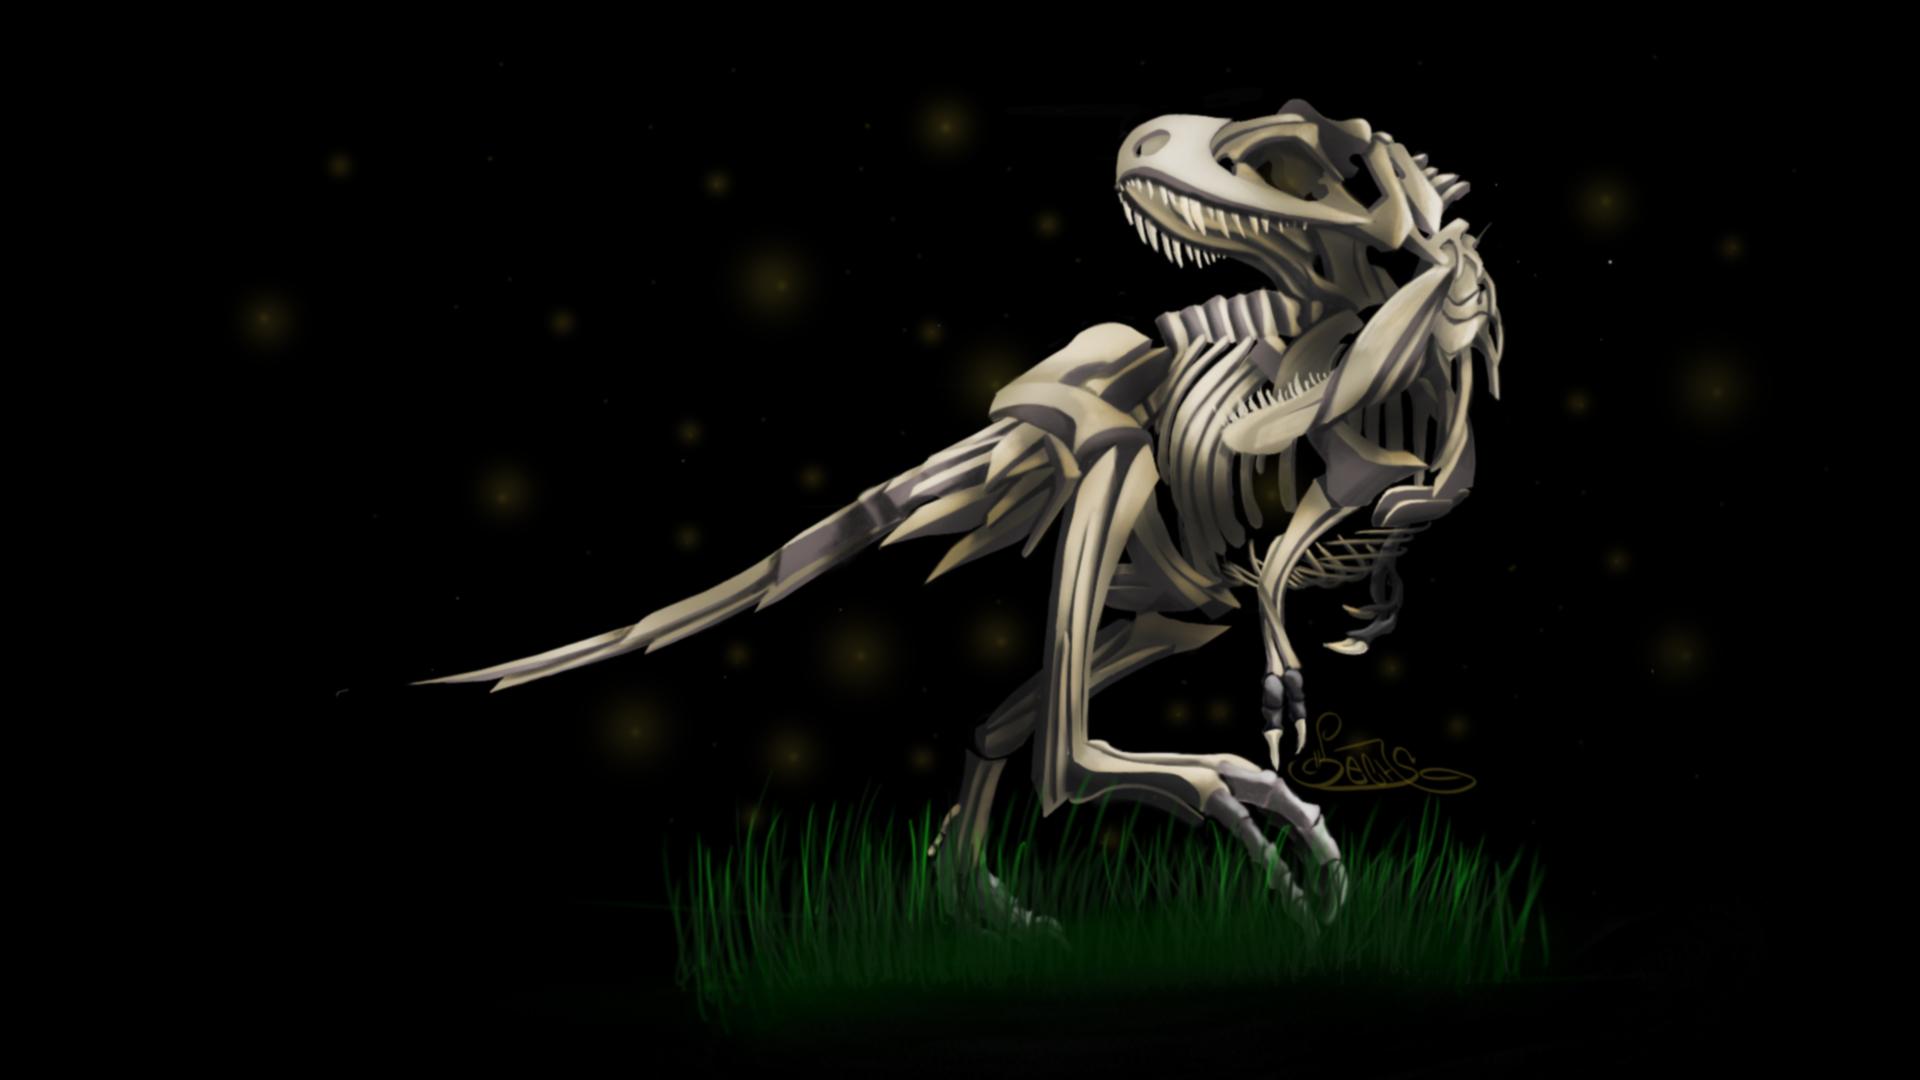 dinosaur Wallpaper Background 3138 1920x1080